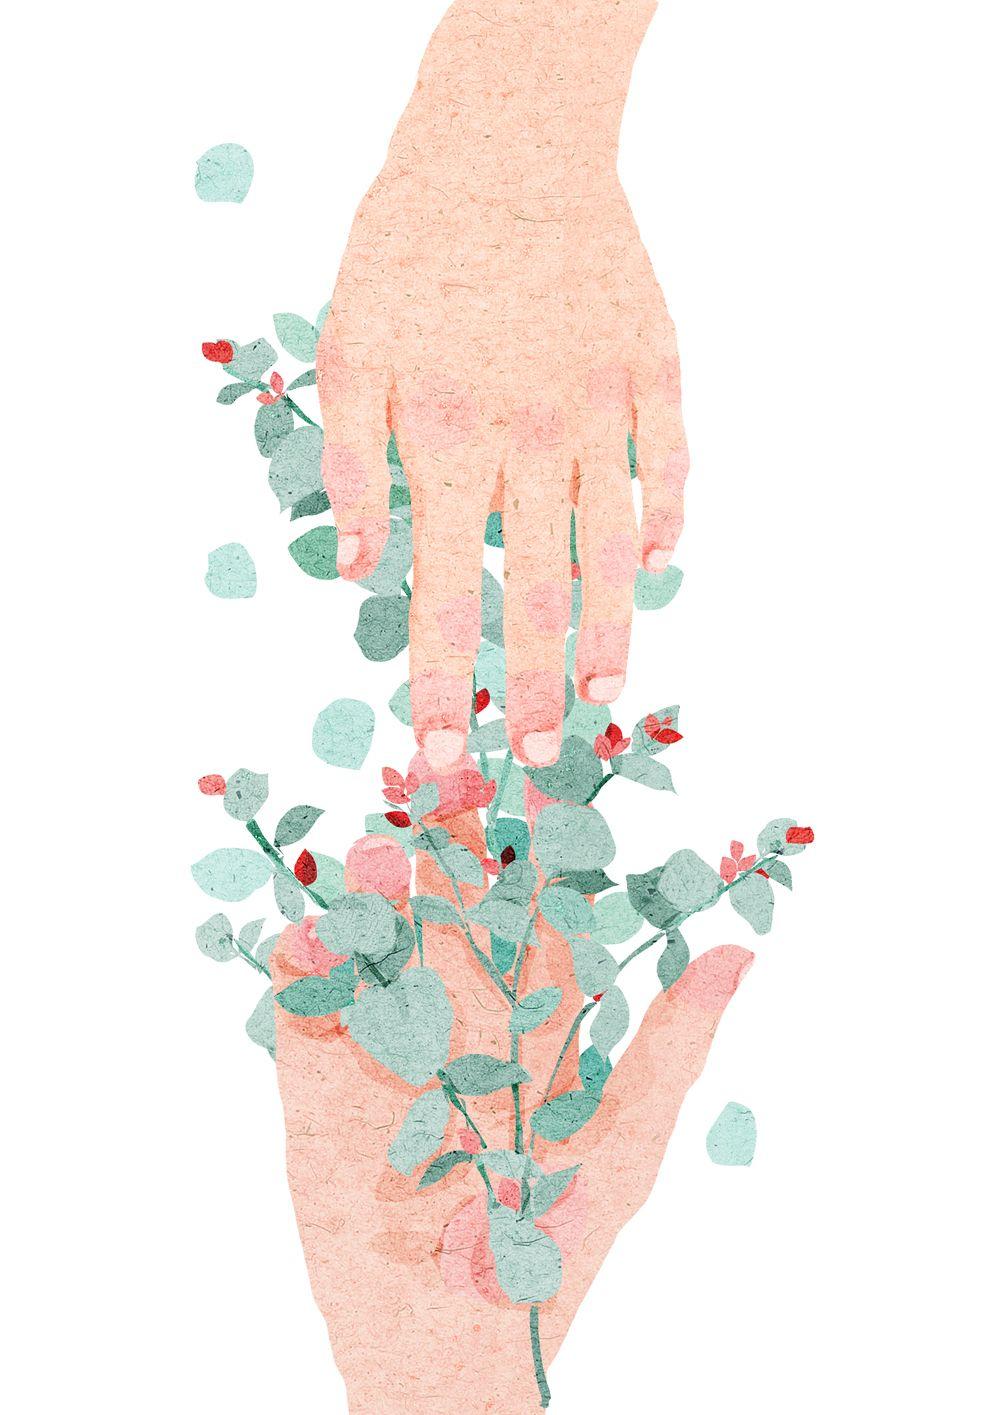 Pinterest moniquejtutton art artist artsy illustration digital painting sketch inspiration concept design